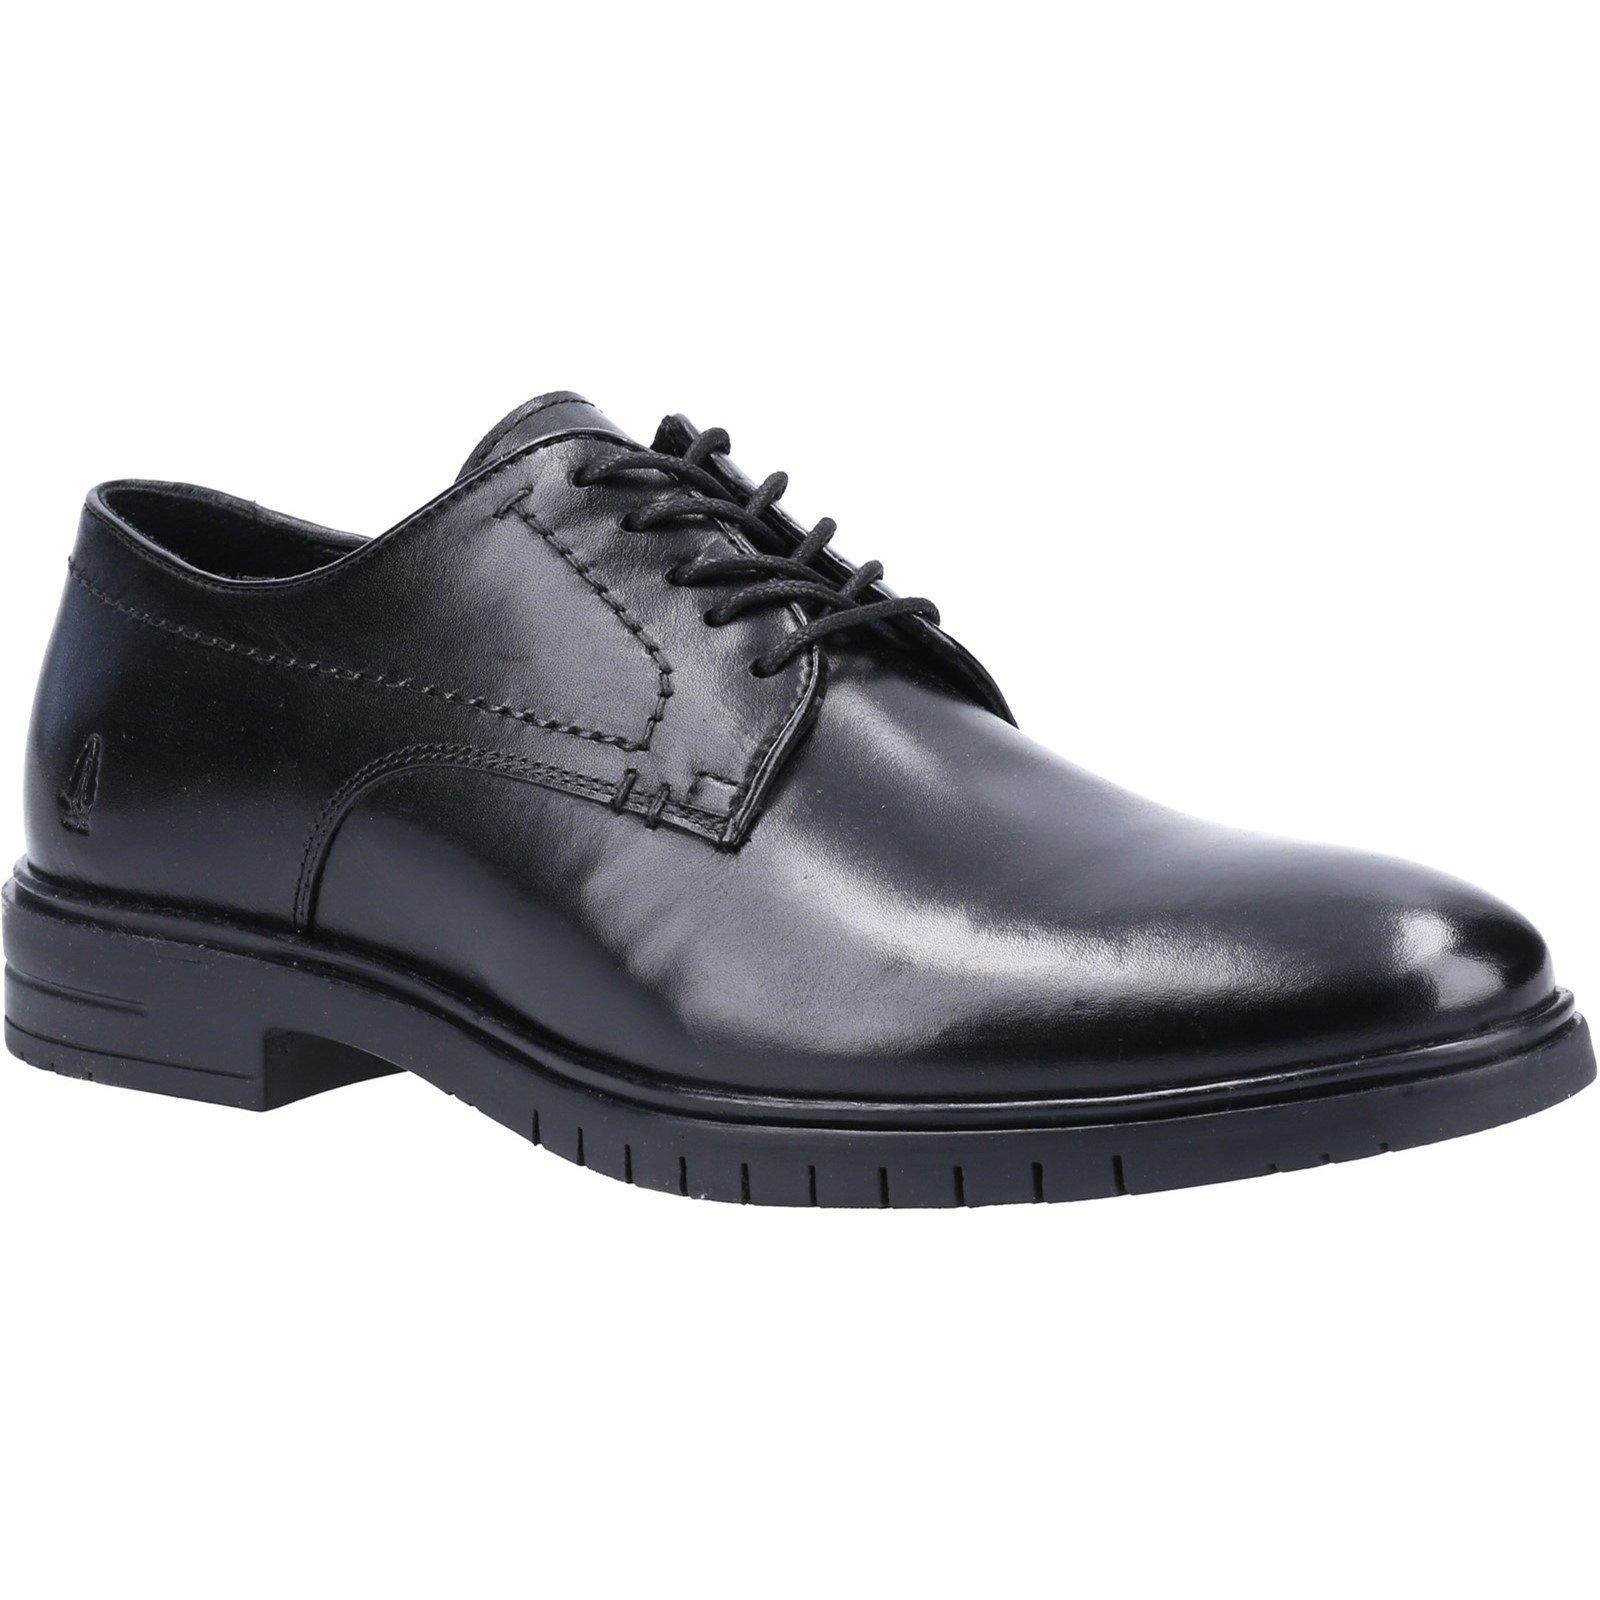 Hush Puppies Men's Sterling Lace Derby Shoe Black 31992 - Black 8